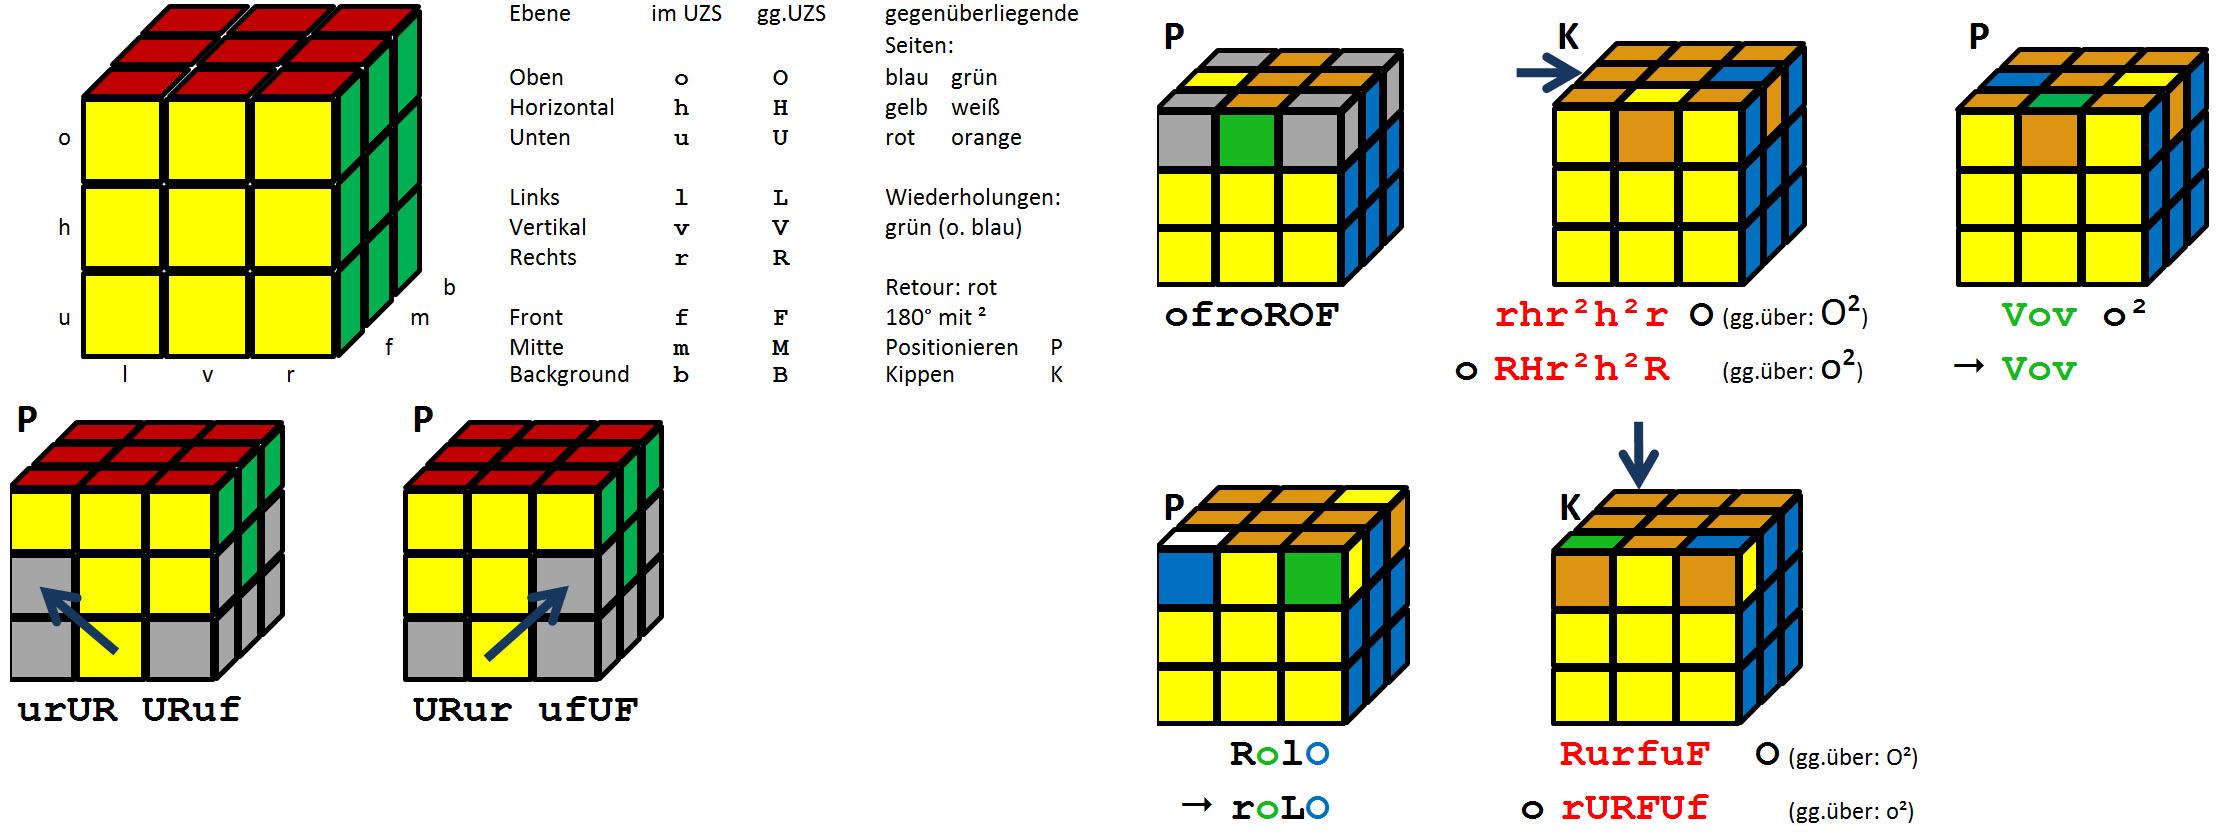 Rubiks Cube (Zauberwürfel) | Sebastian Brandt